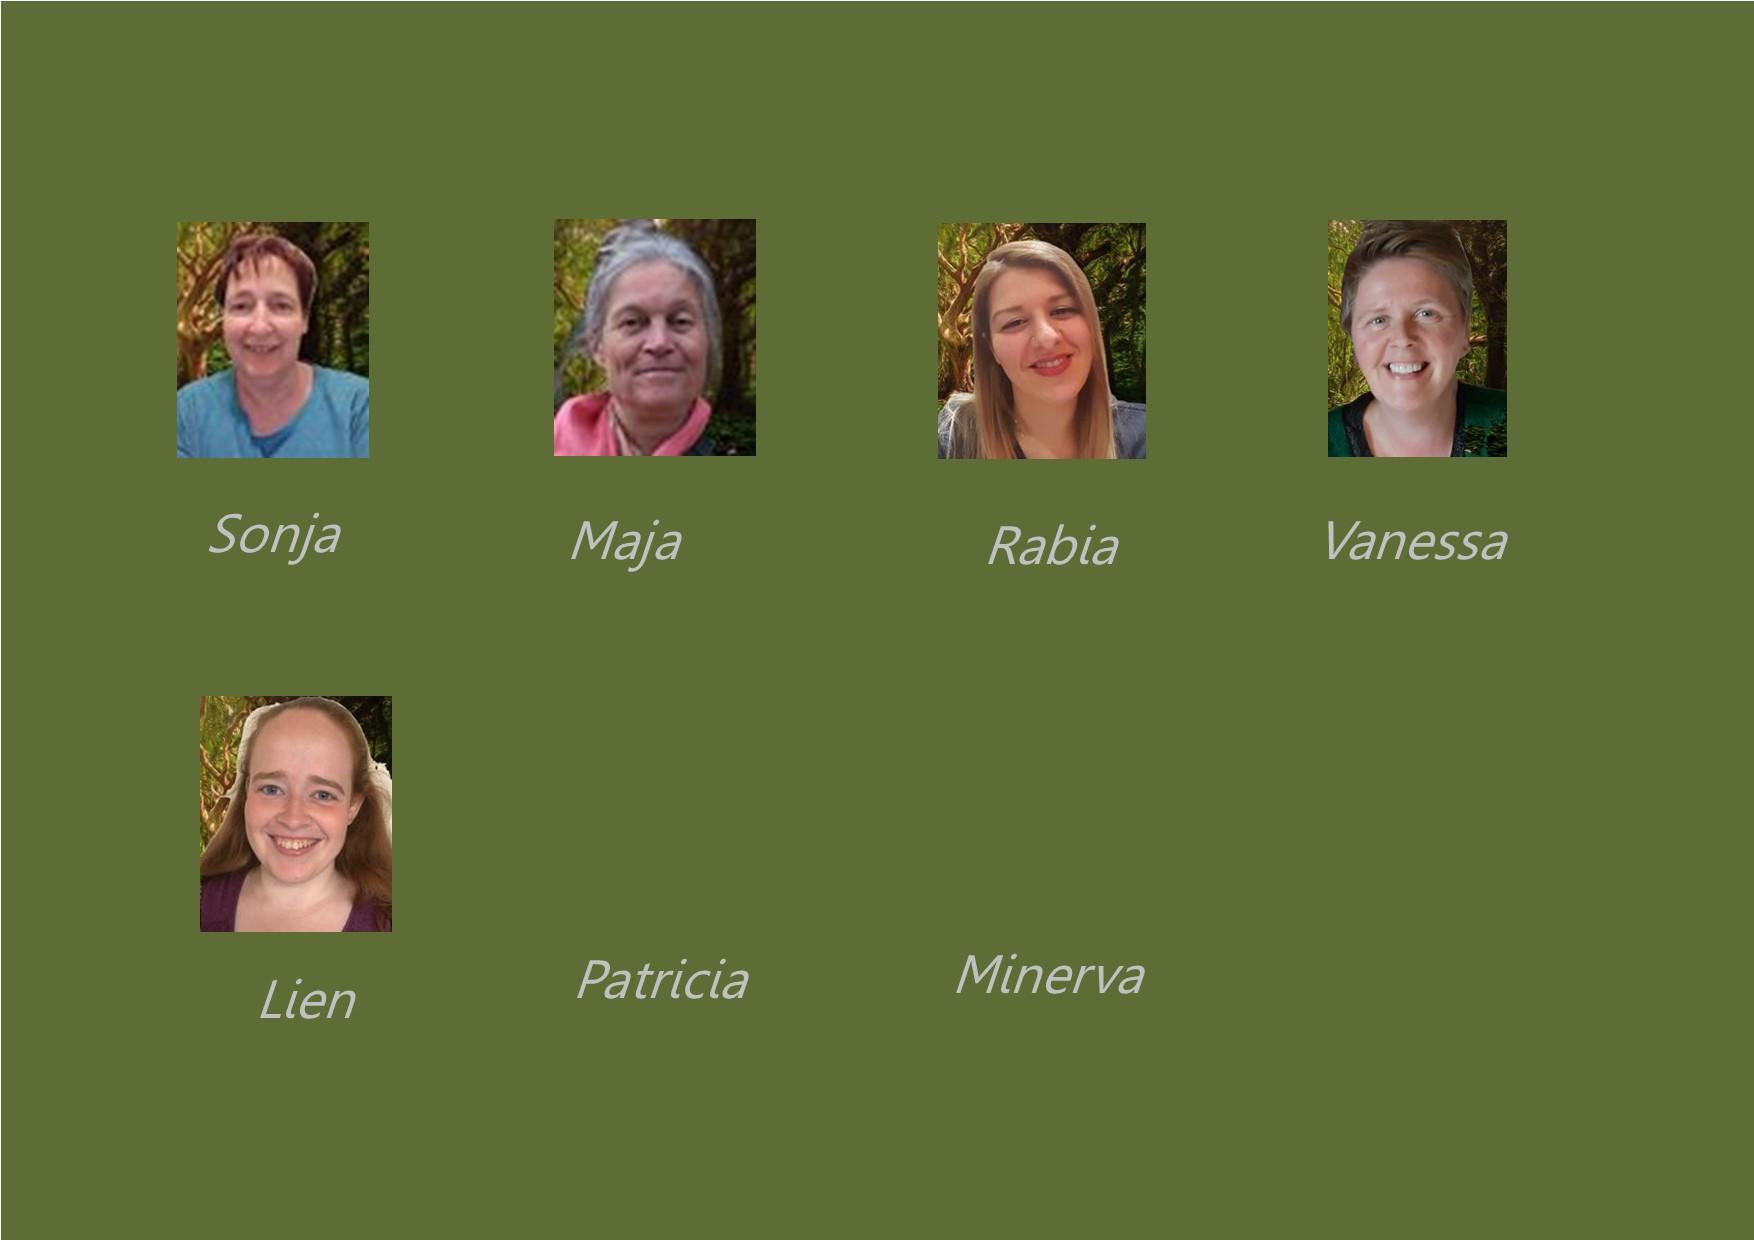 <p>buitenschoolse opvang: juf Lien, juf Sonja, juf Maja, juf Rabia, juf Vanessa, juf Patricia en juf Minerva</p>